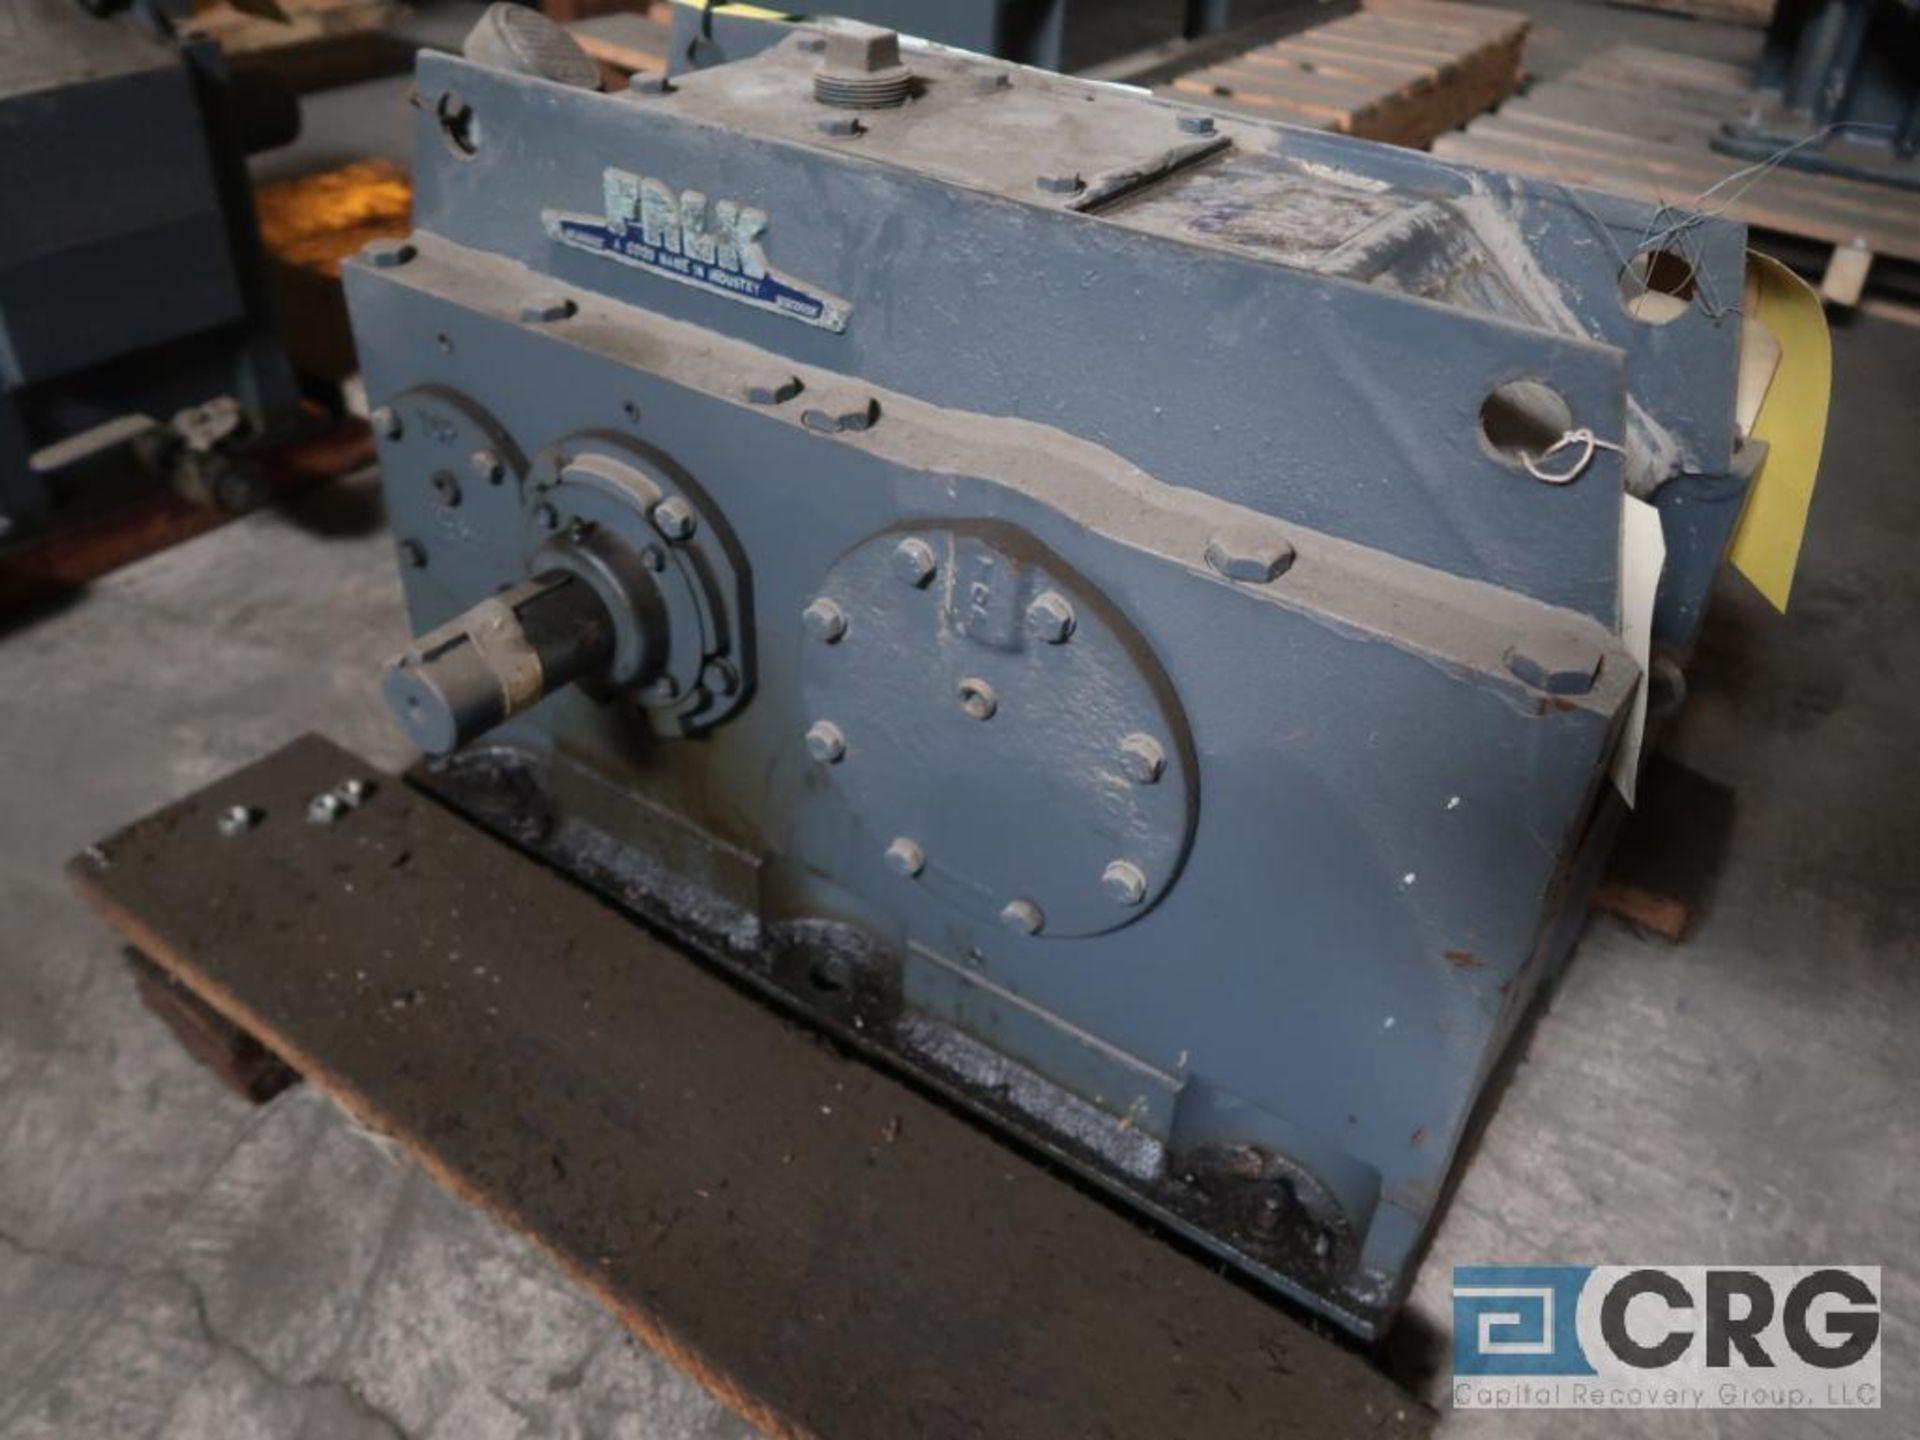 Falk 2050Y1L gear box, ratio- 6.928, input RPM 1,750, output RPM 252.6, service rate HP. 75 (Next - Image 2 of 3